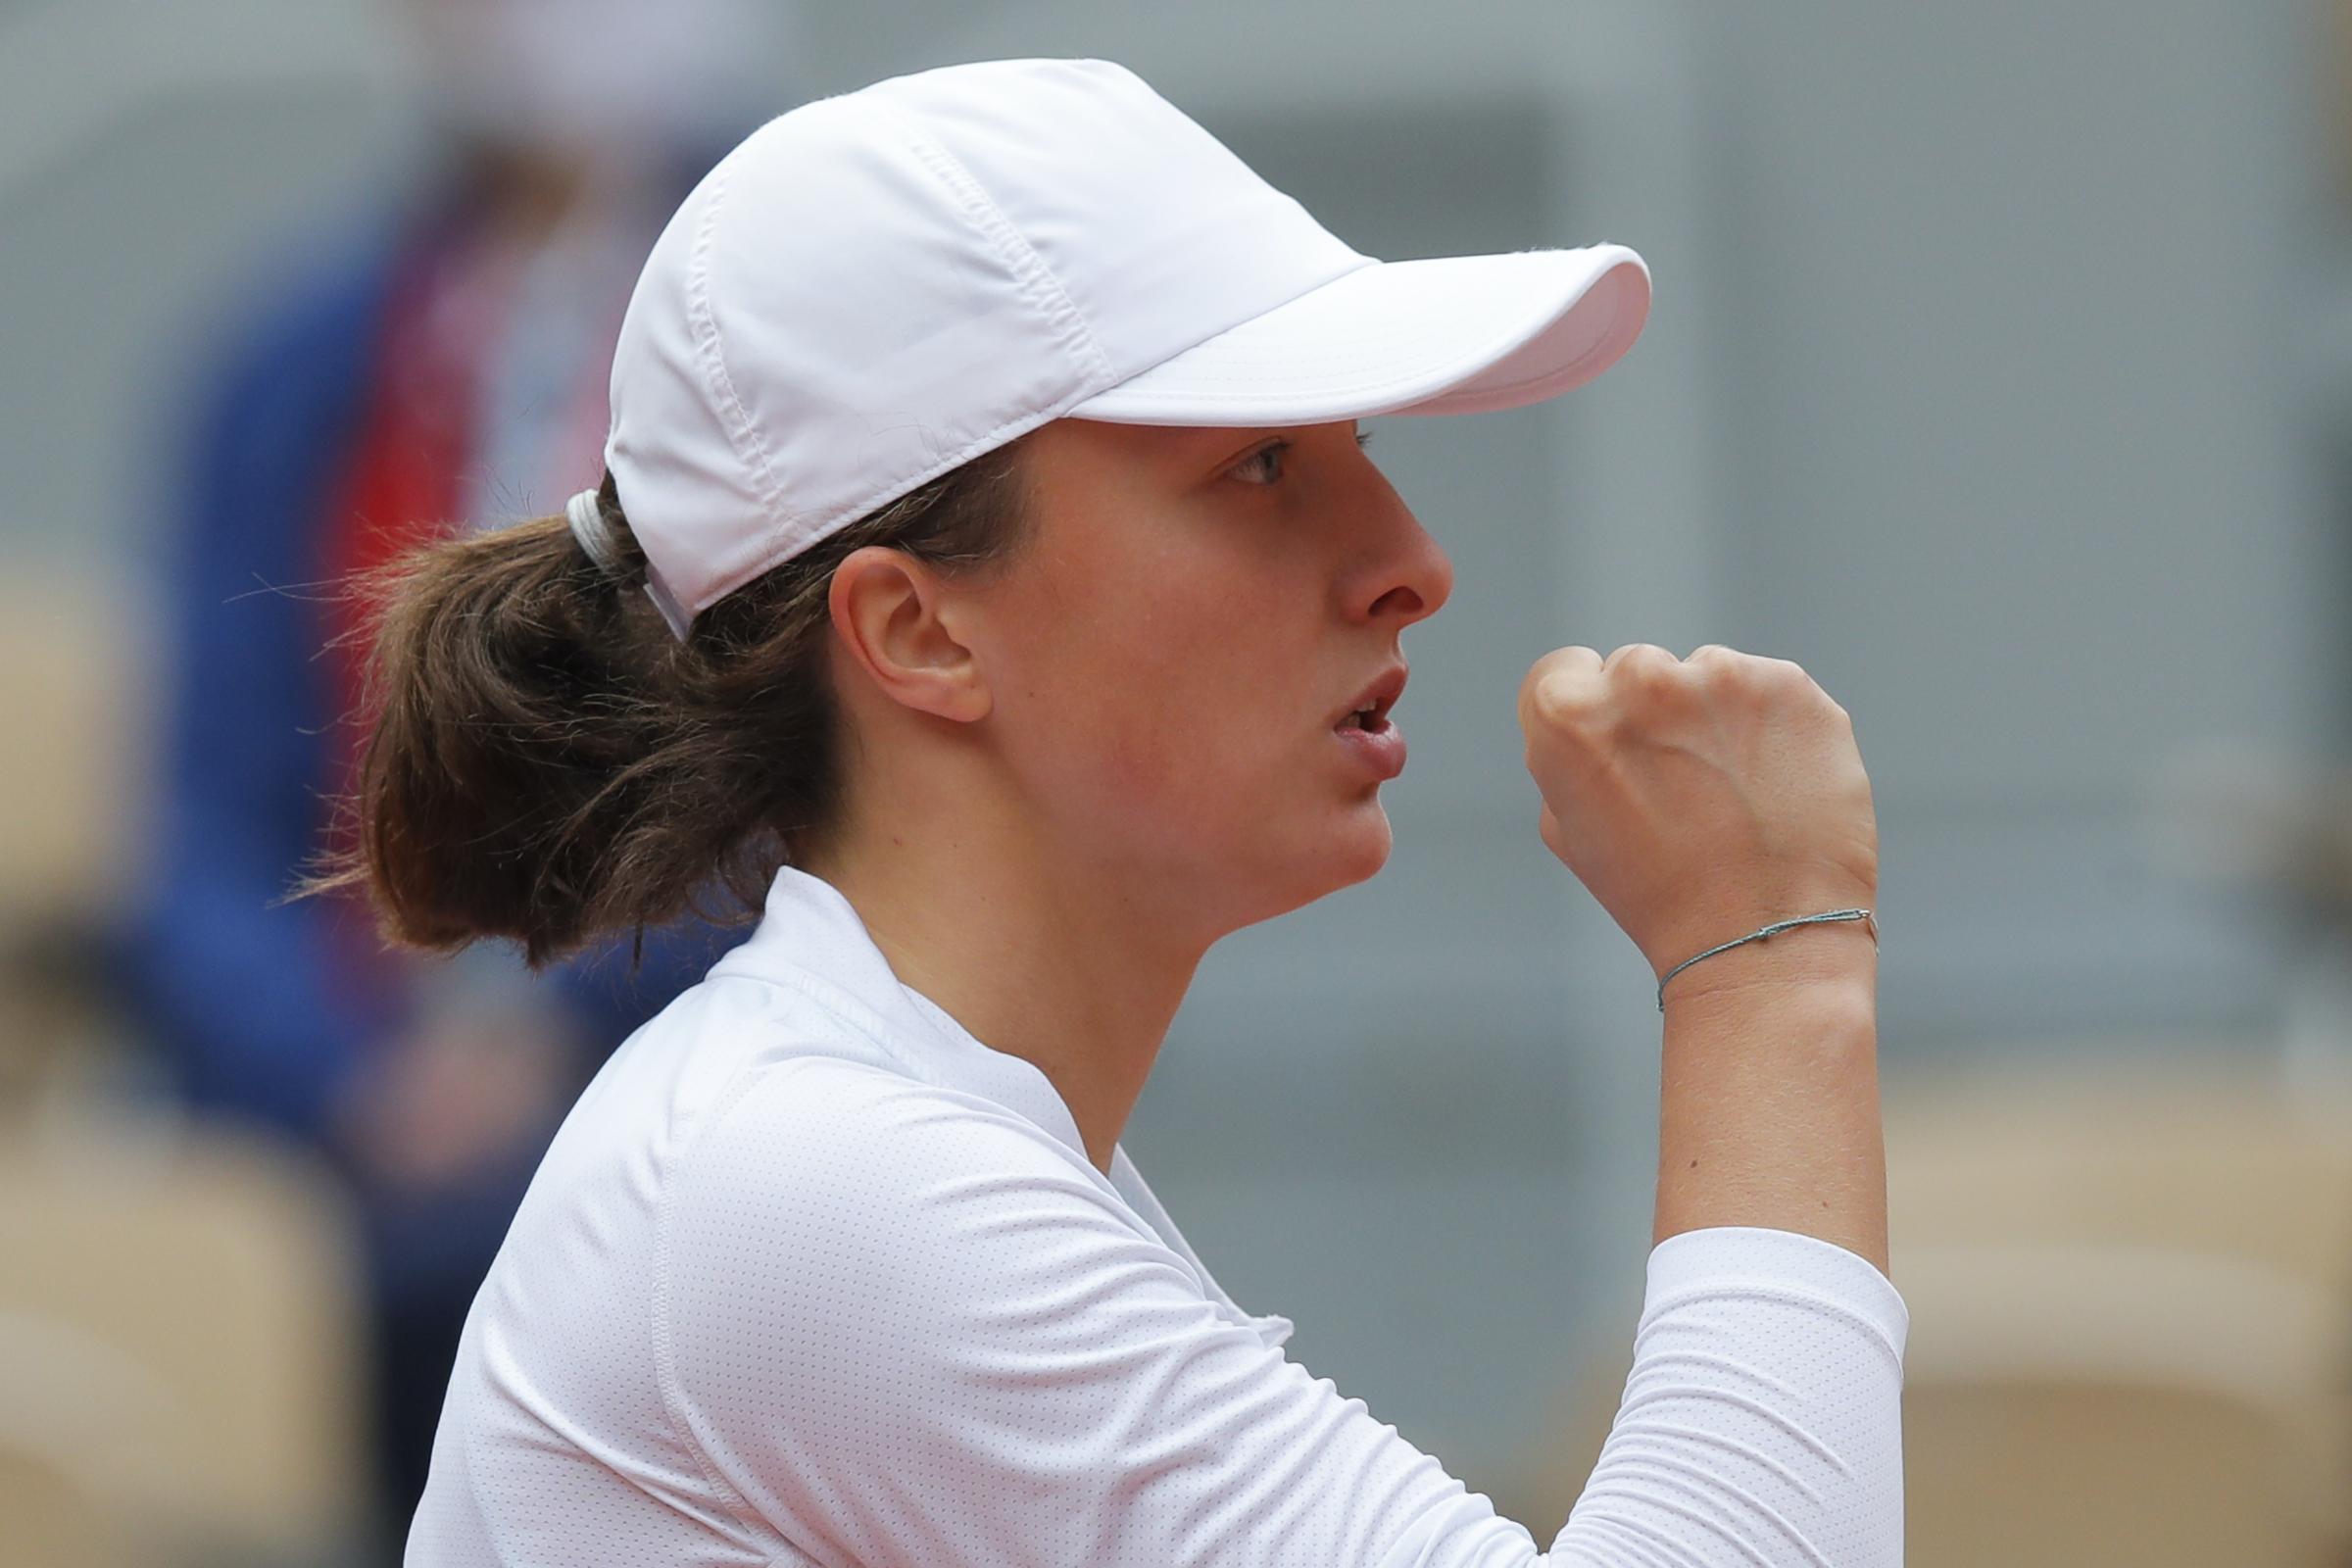 Remaja Iga Swiatek mengalahkan Nadia Podoroska untuk mara ke final grand slam pertama